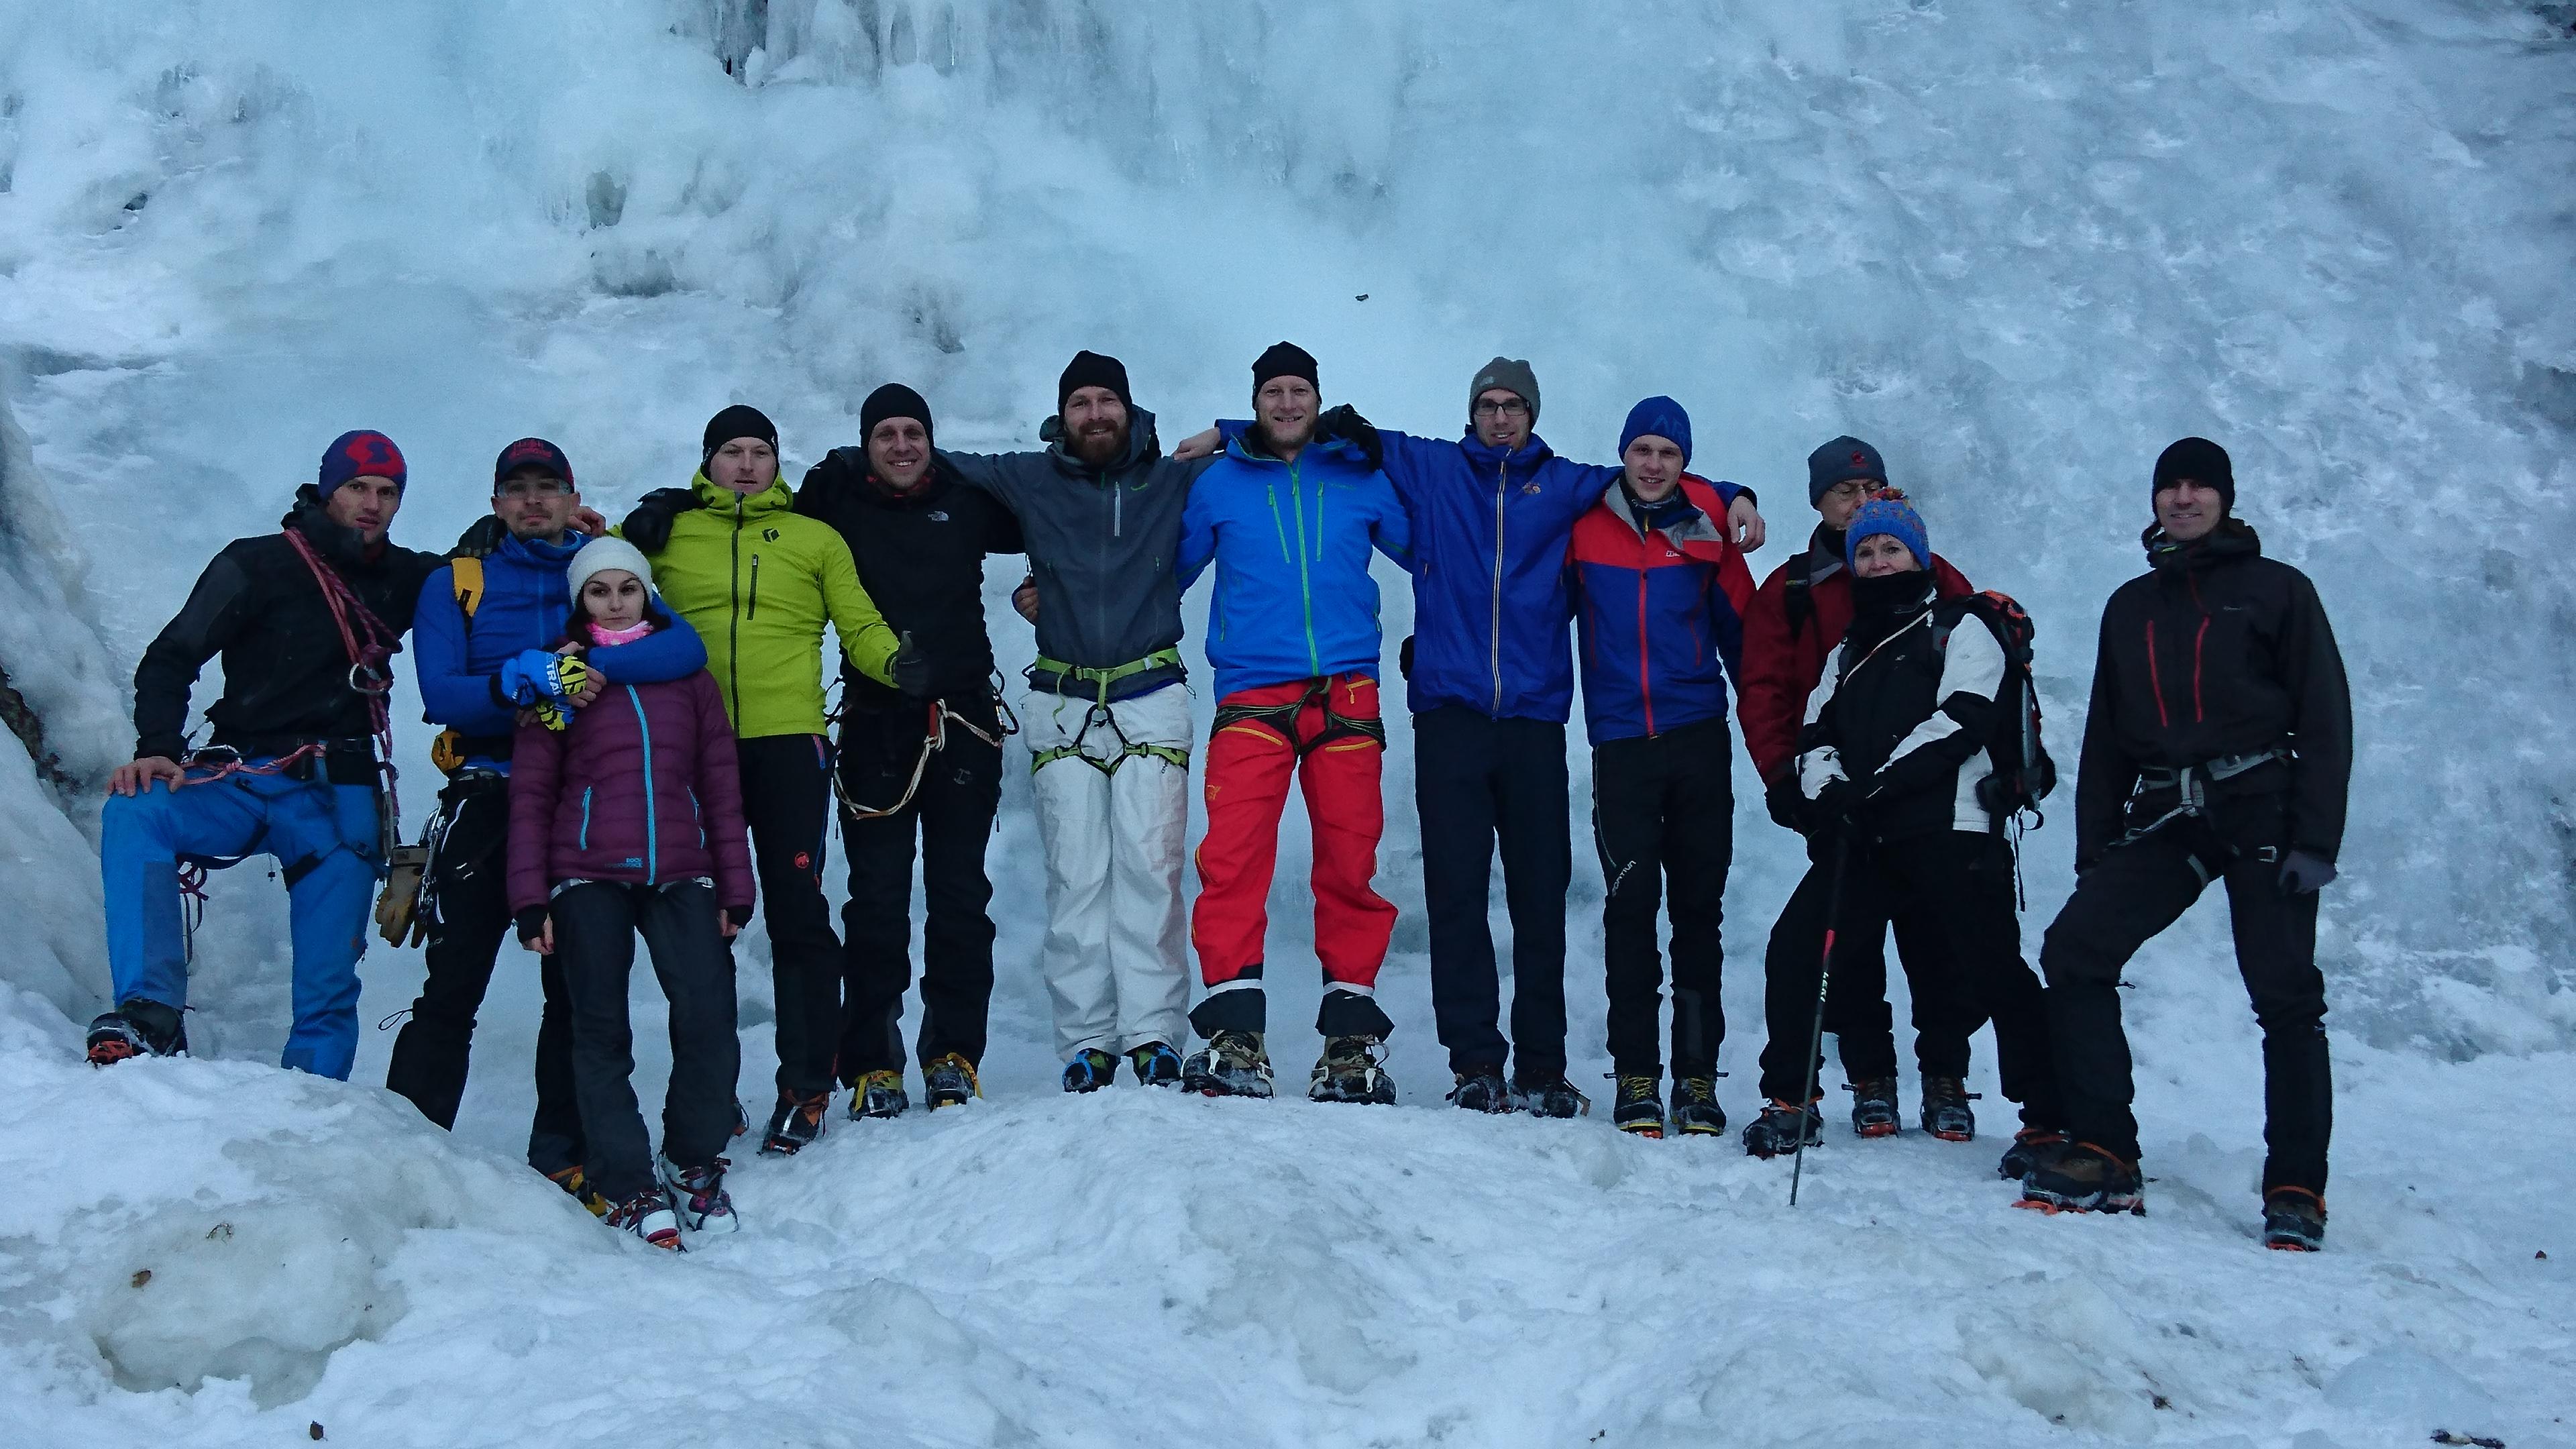 Klettergurt Für Dicke : Alpsclimbing alps eiskletteropening kolm saigurn 2018